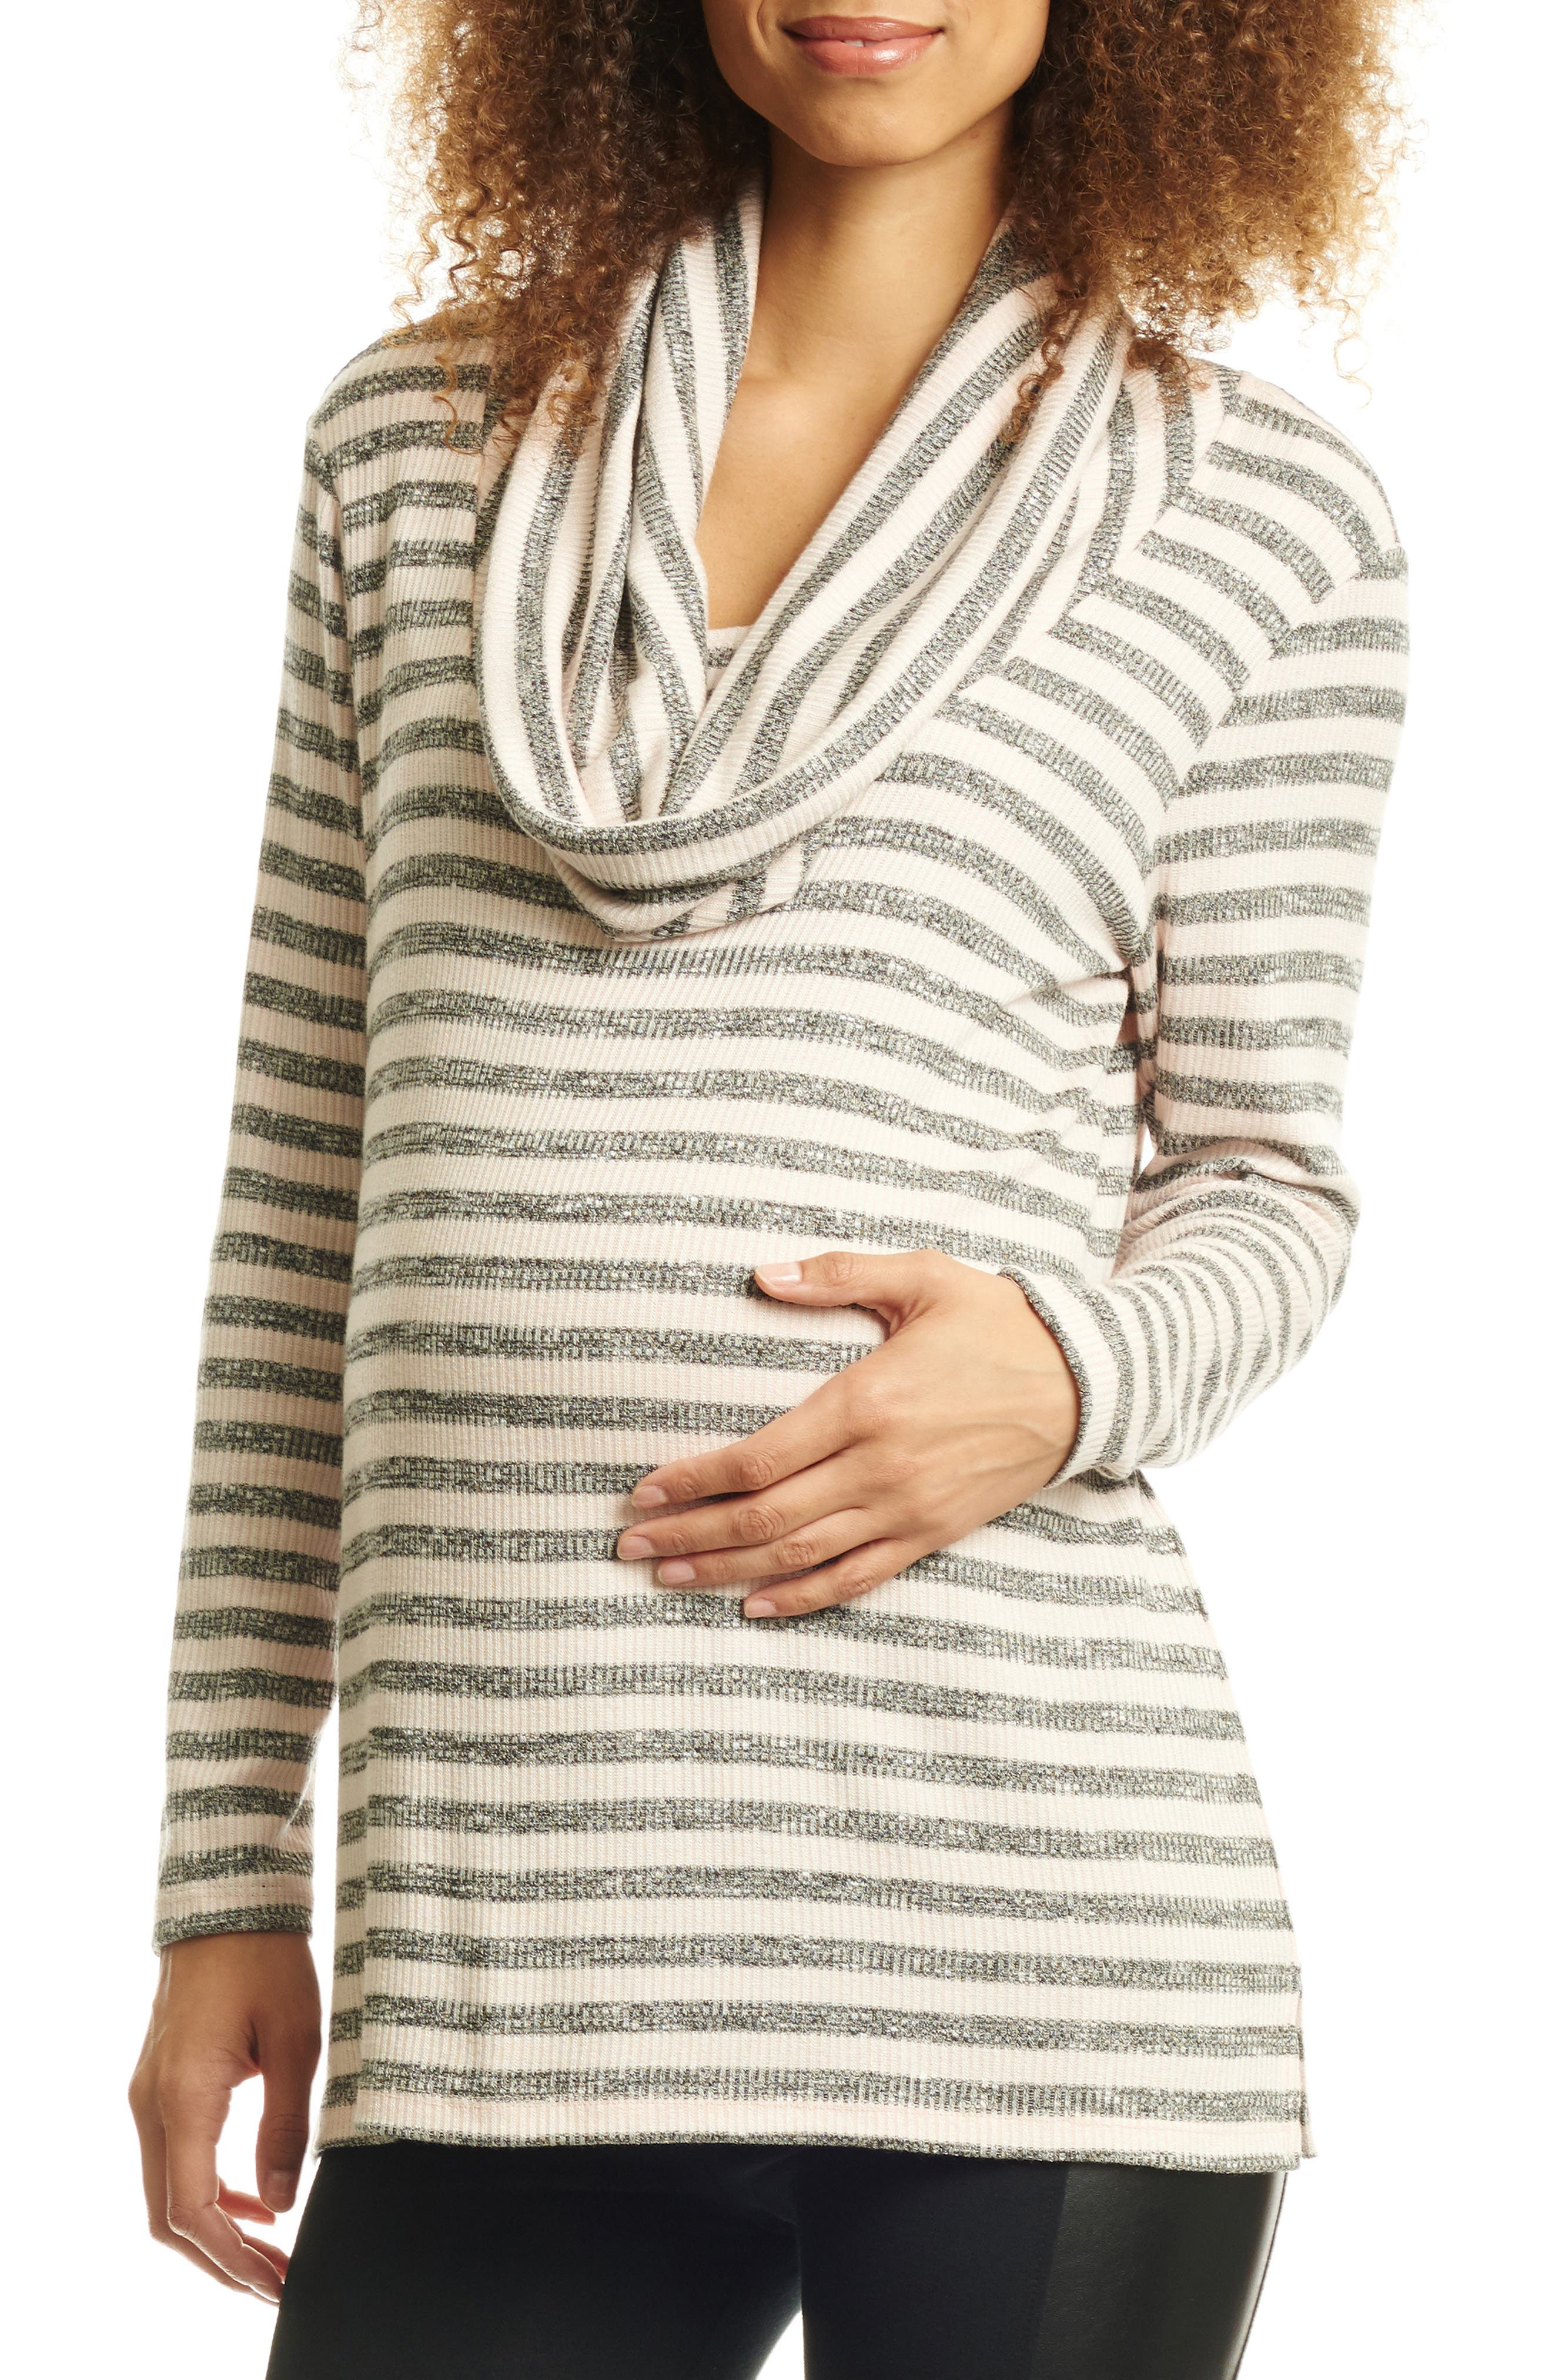 Reina Cowl Neck Maternity/Nursing Top,                             Main thumbnail 1, color,                             CHARCOAL STRIPE